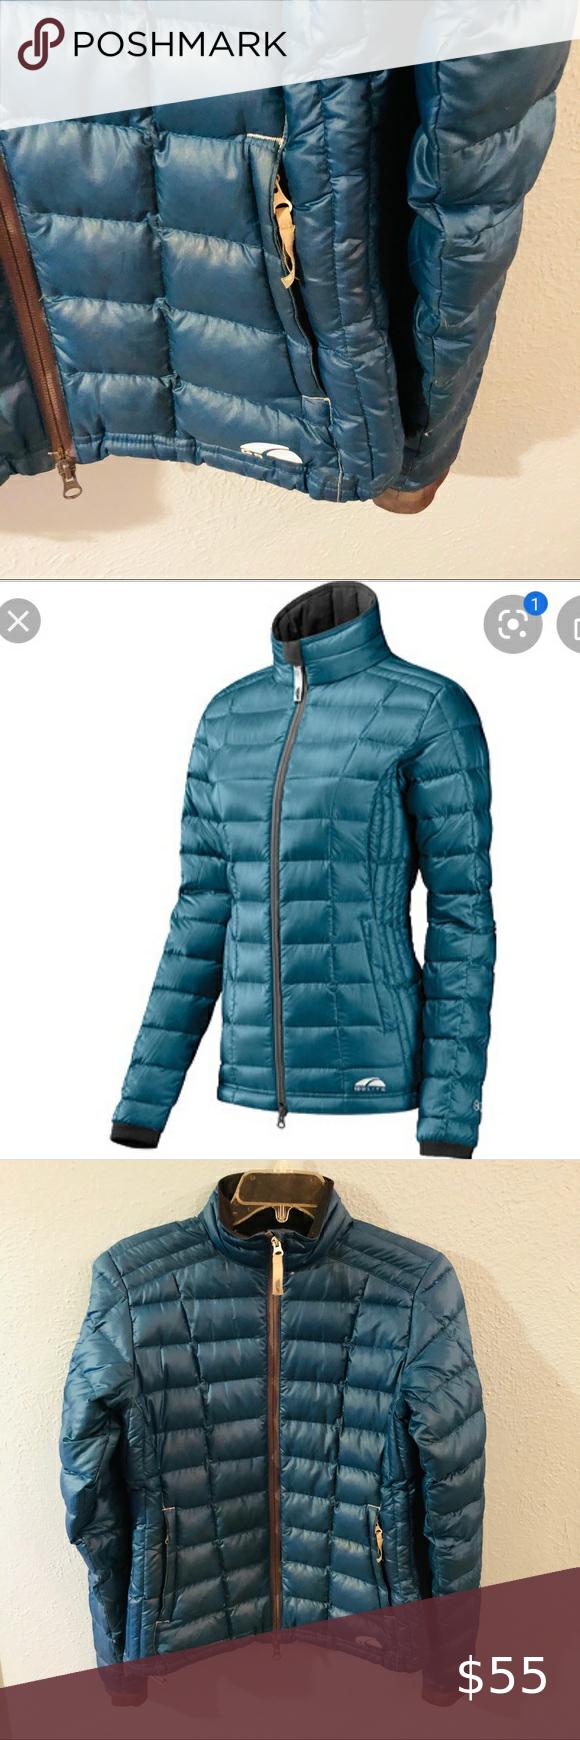 Golite 800 Pertex Microlight Eco Puffer Jacket Coats Jackets Women Puffer Jackets Jackets [ 1740 x 580 Pixel ]